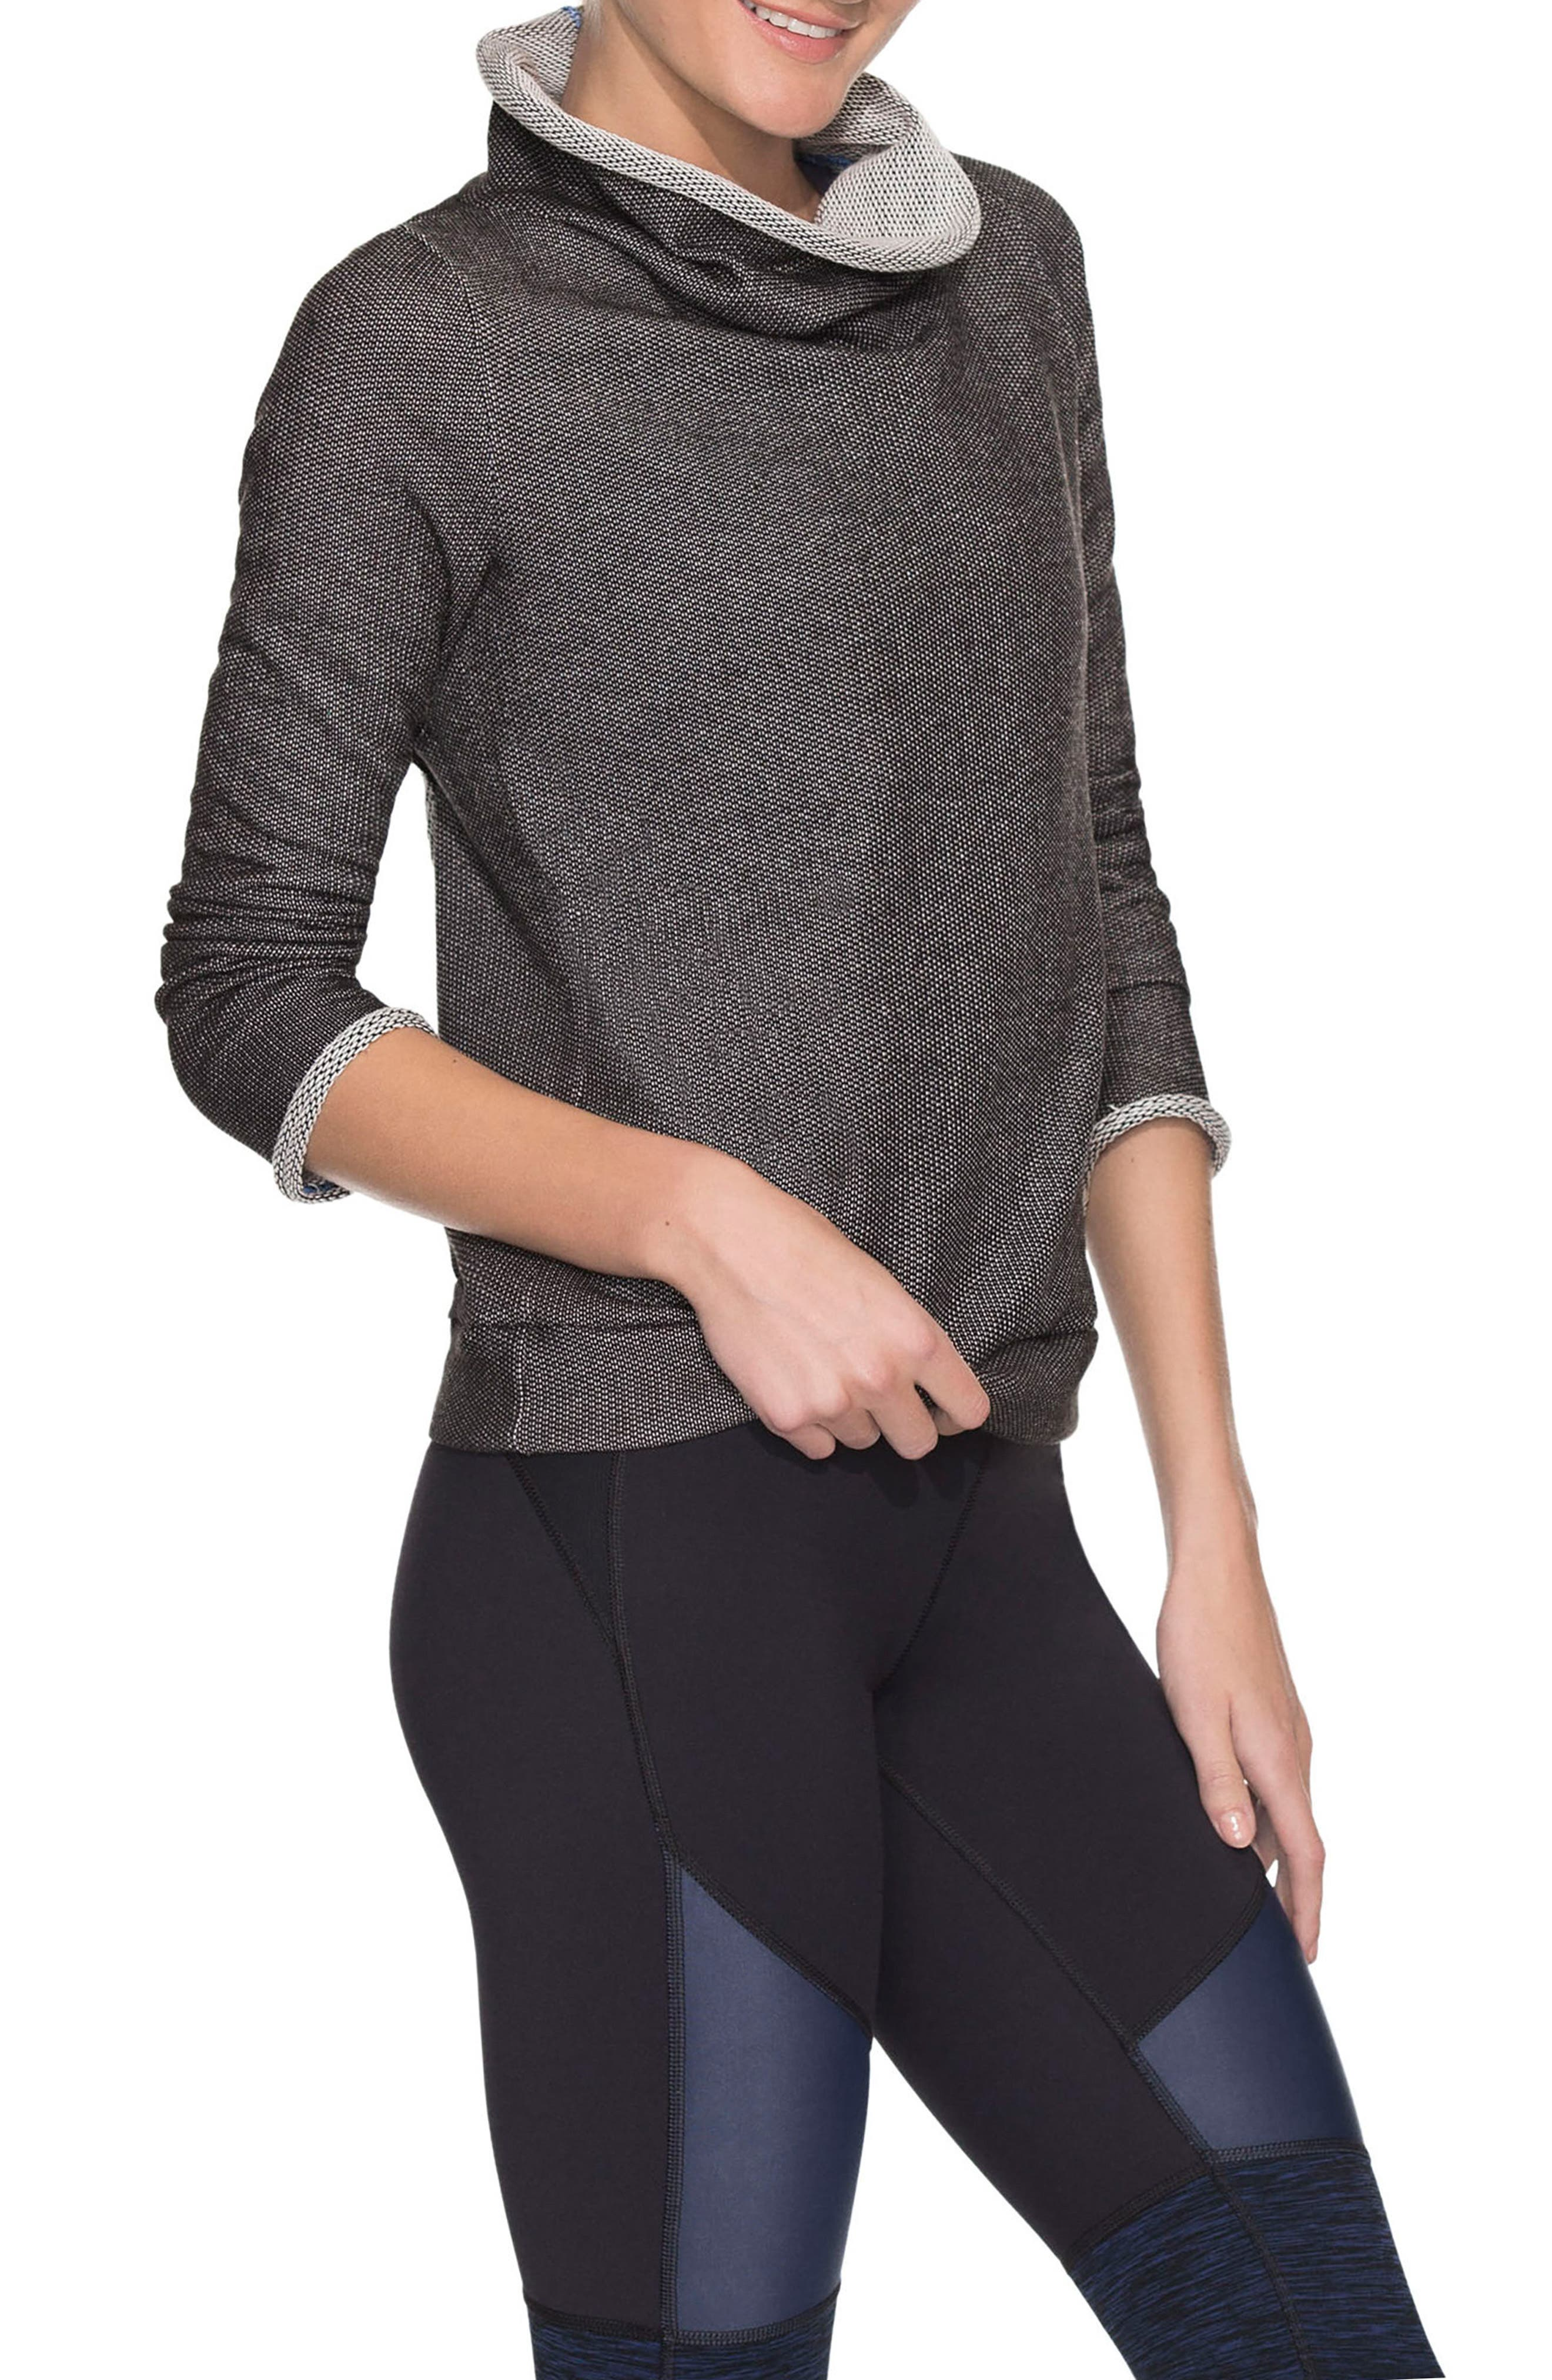 Cloudburst Sweatshirt,                         Main,                         color,